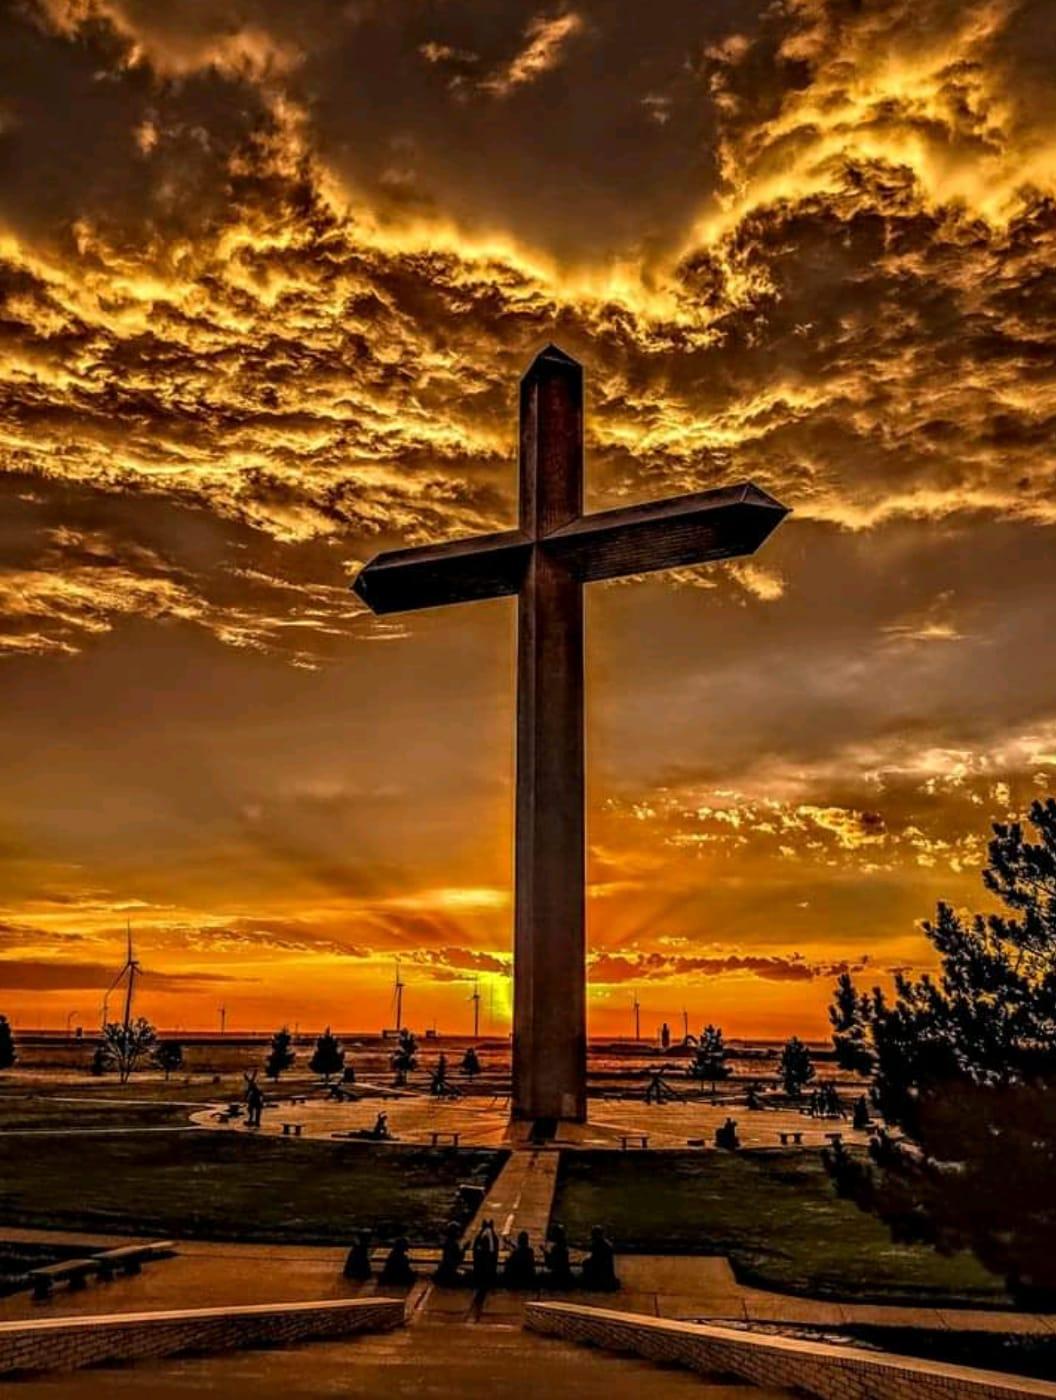 https://afum-media.s3.amazonaws.com/atlantic-first-united-methodist-church/images/92911020_3011848908866809_428865446716899328_n.jpeg